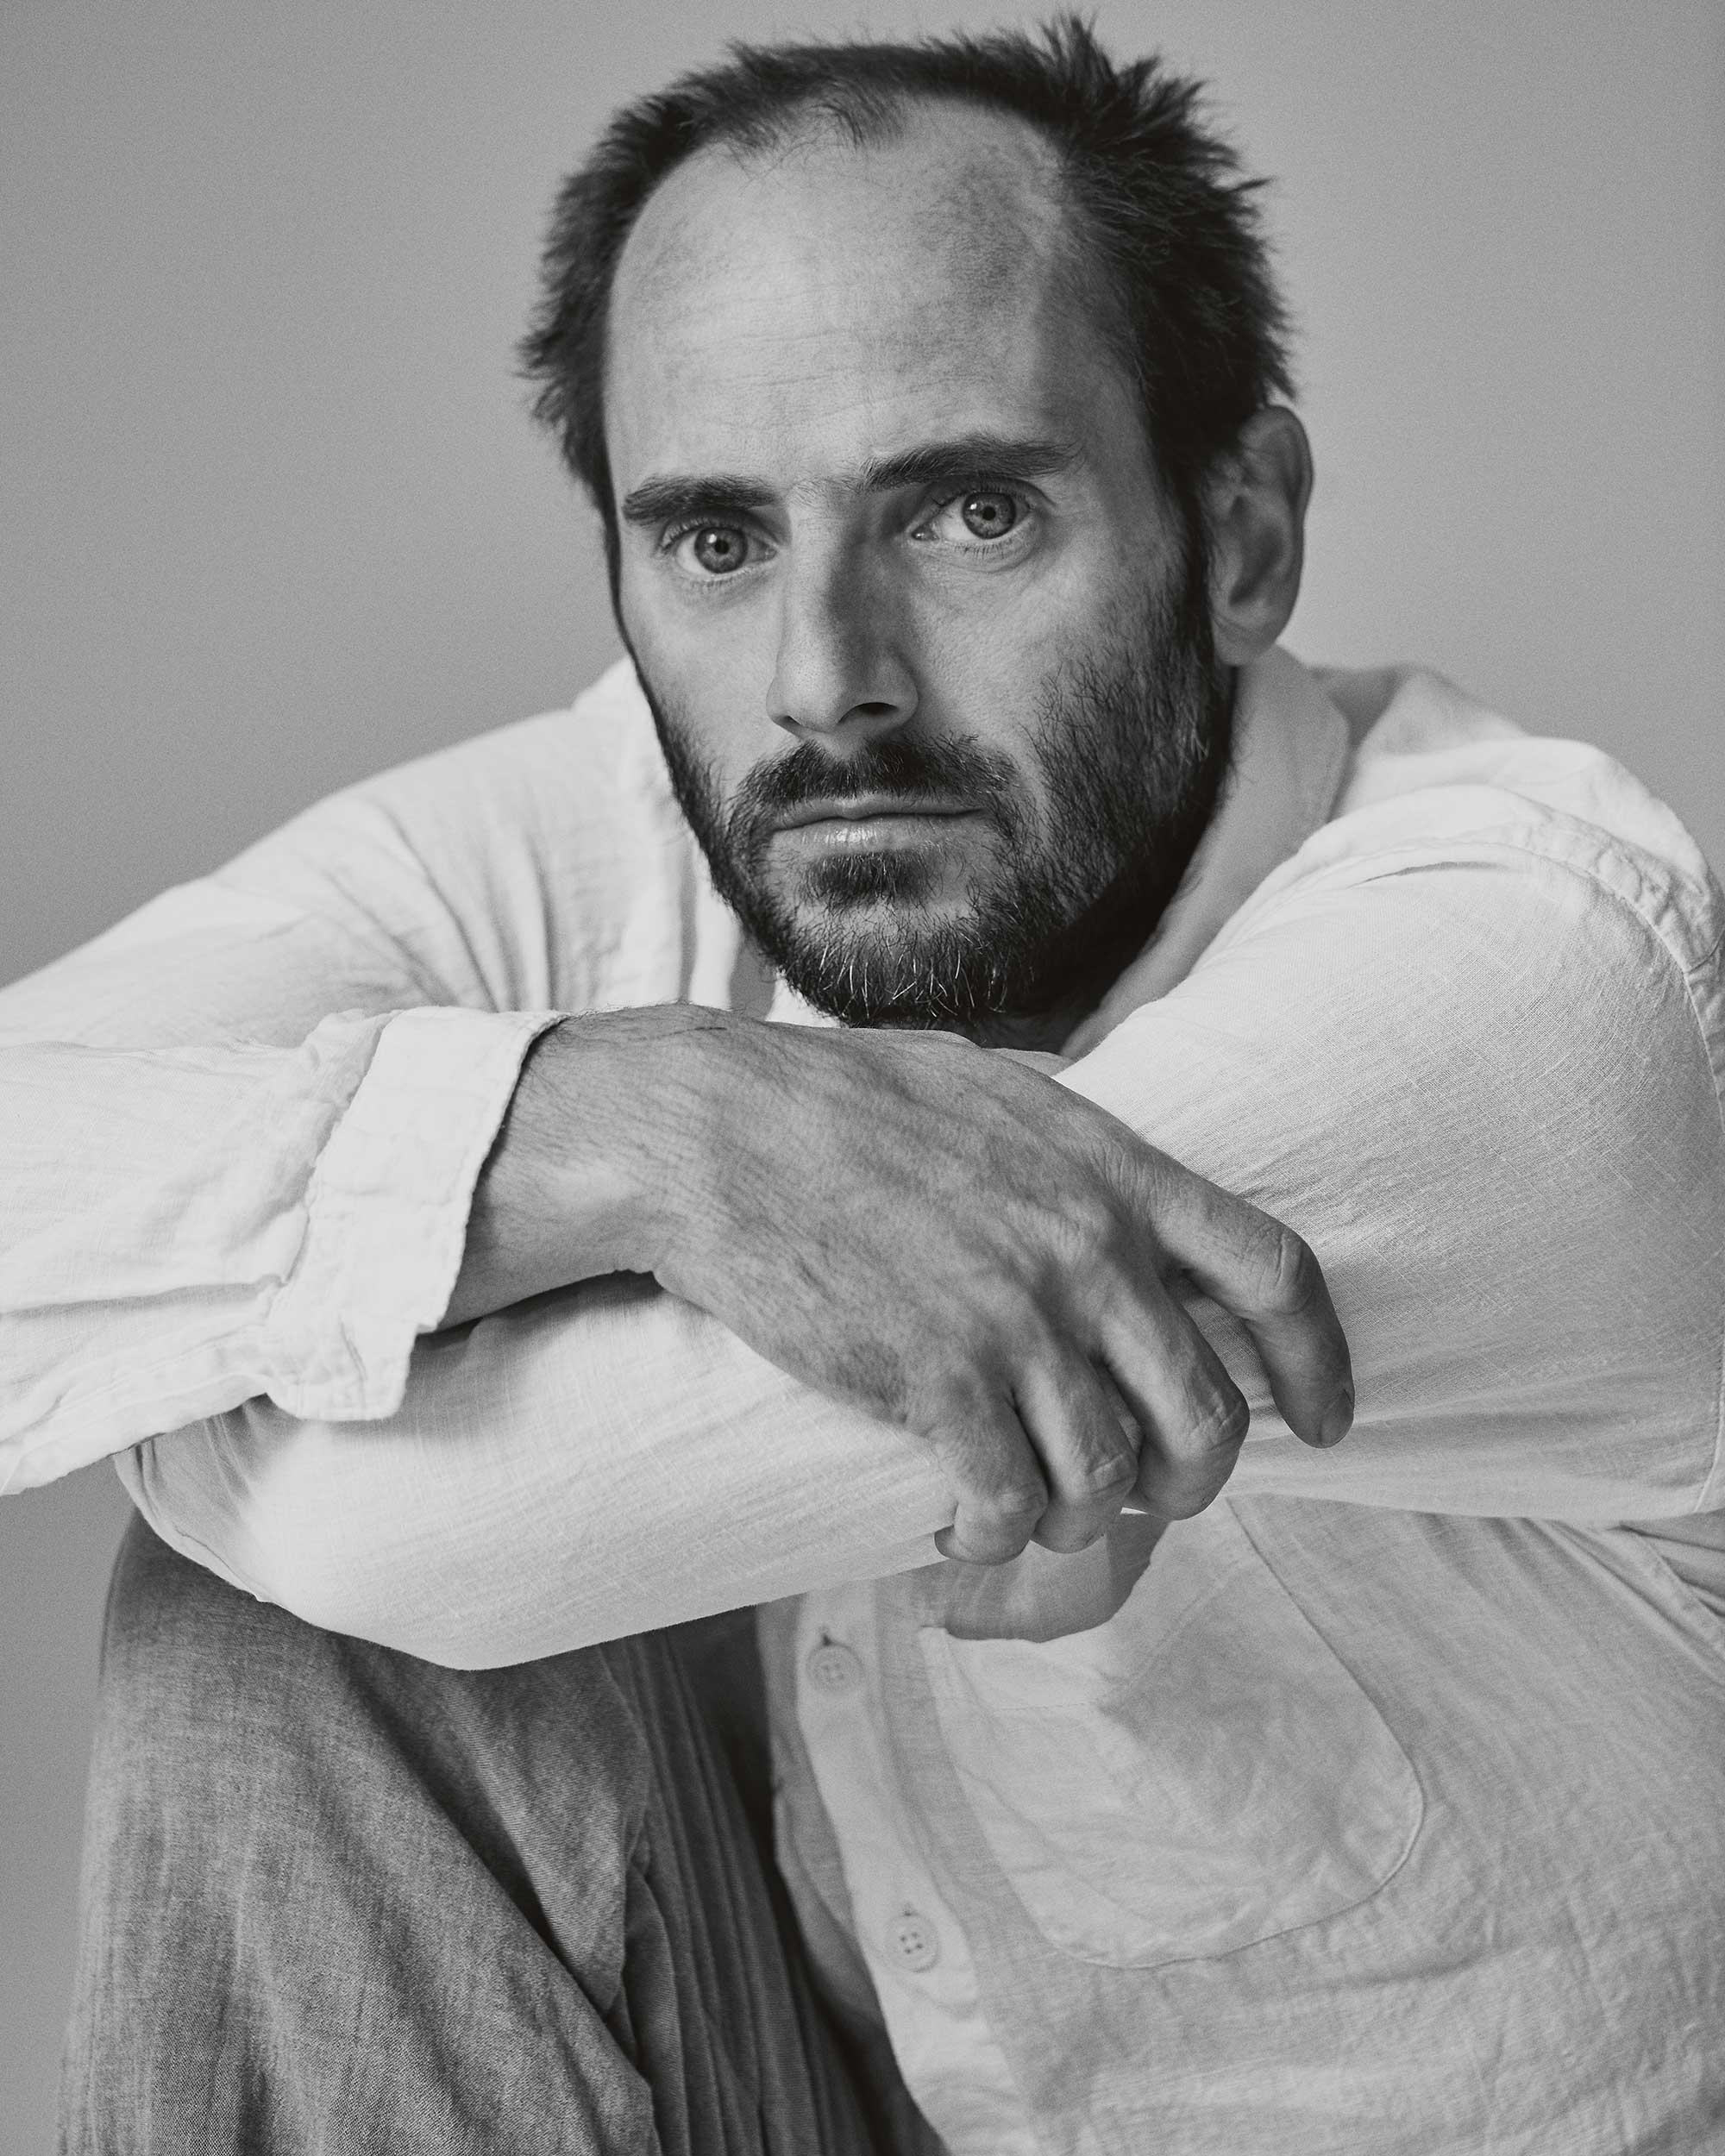 Portrait of Gareth Neal